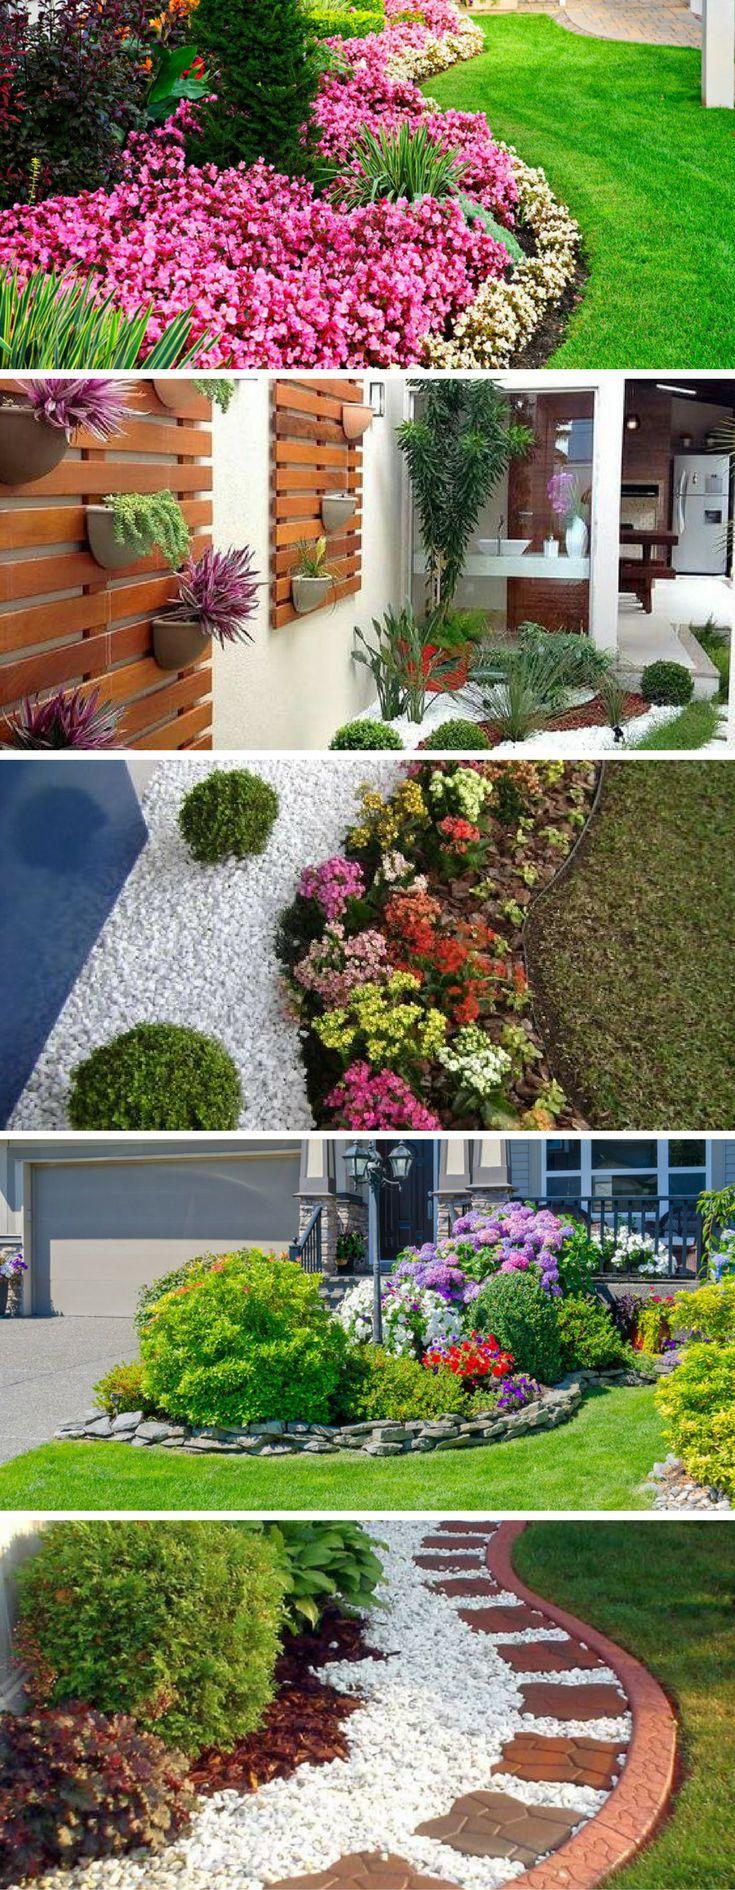 Best 25+ Landscaping around house ideas on Pinterest | Driveway ...